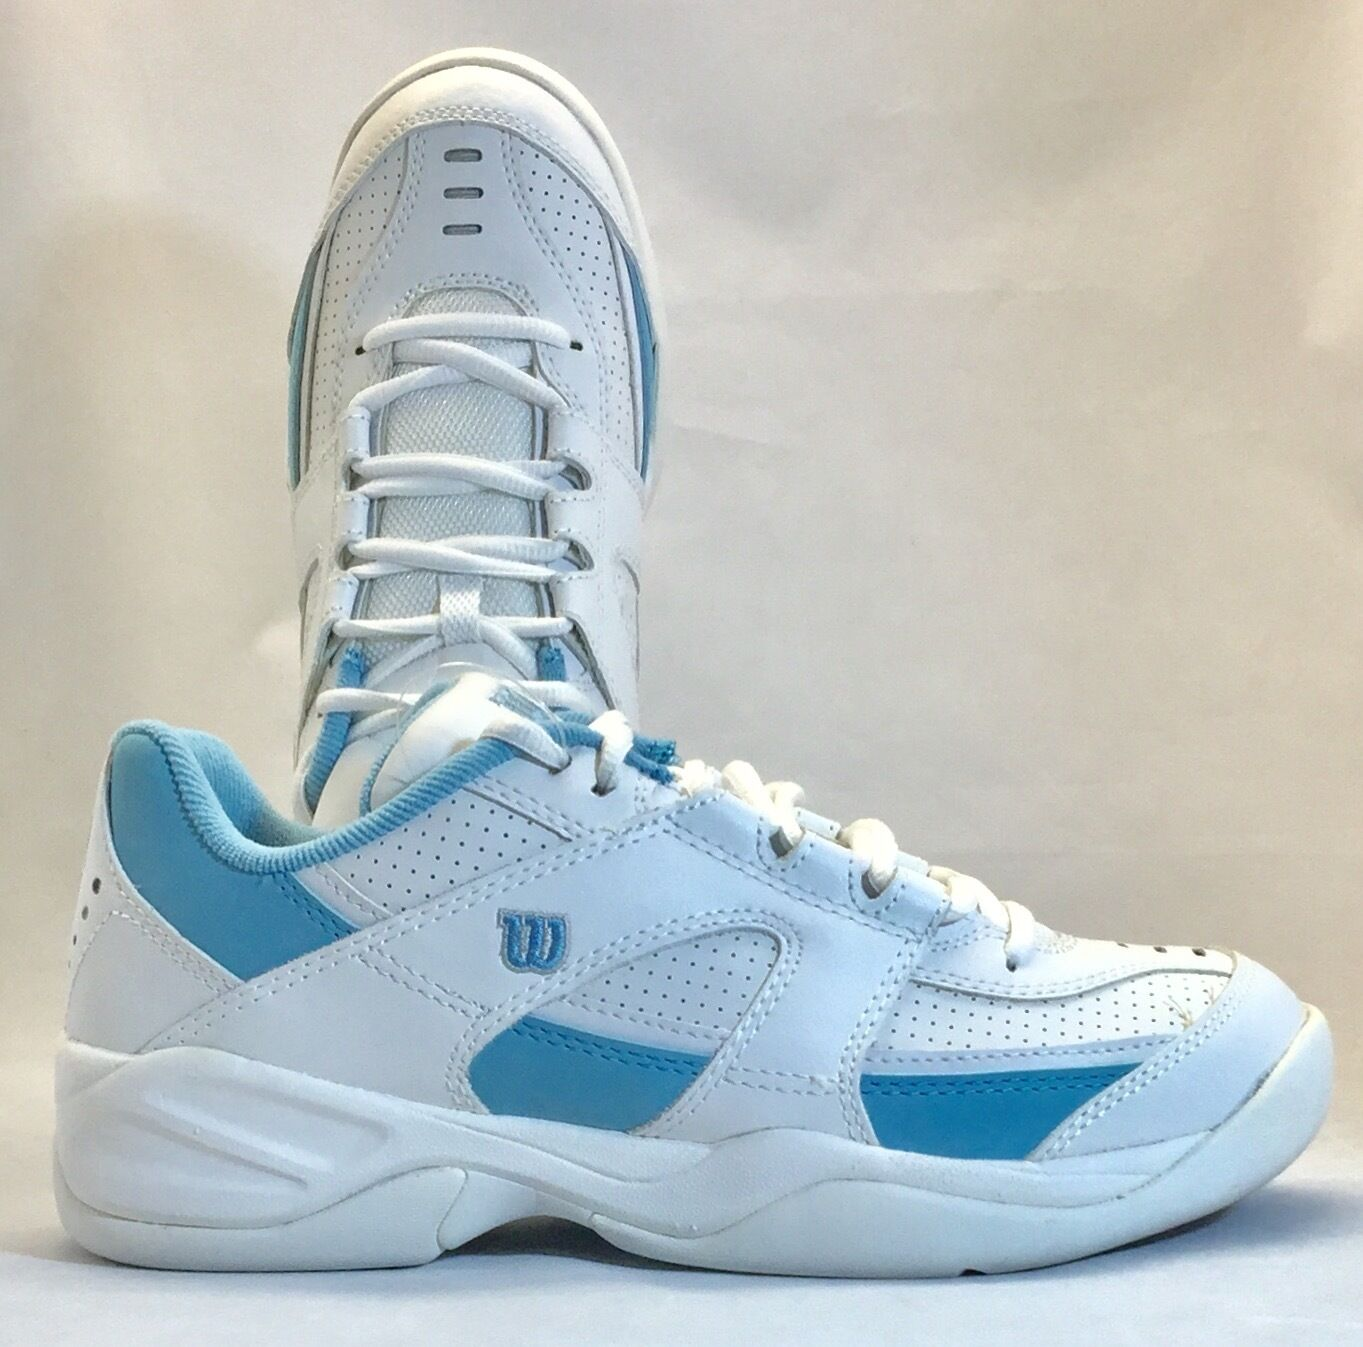 Wilson Advantage Court IV Donna Lightweight Tennis Shoes (B) (S9641)